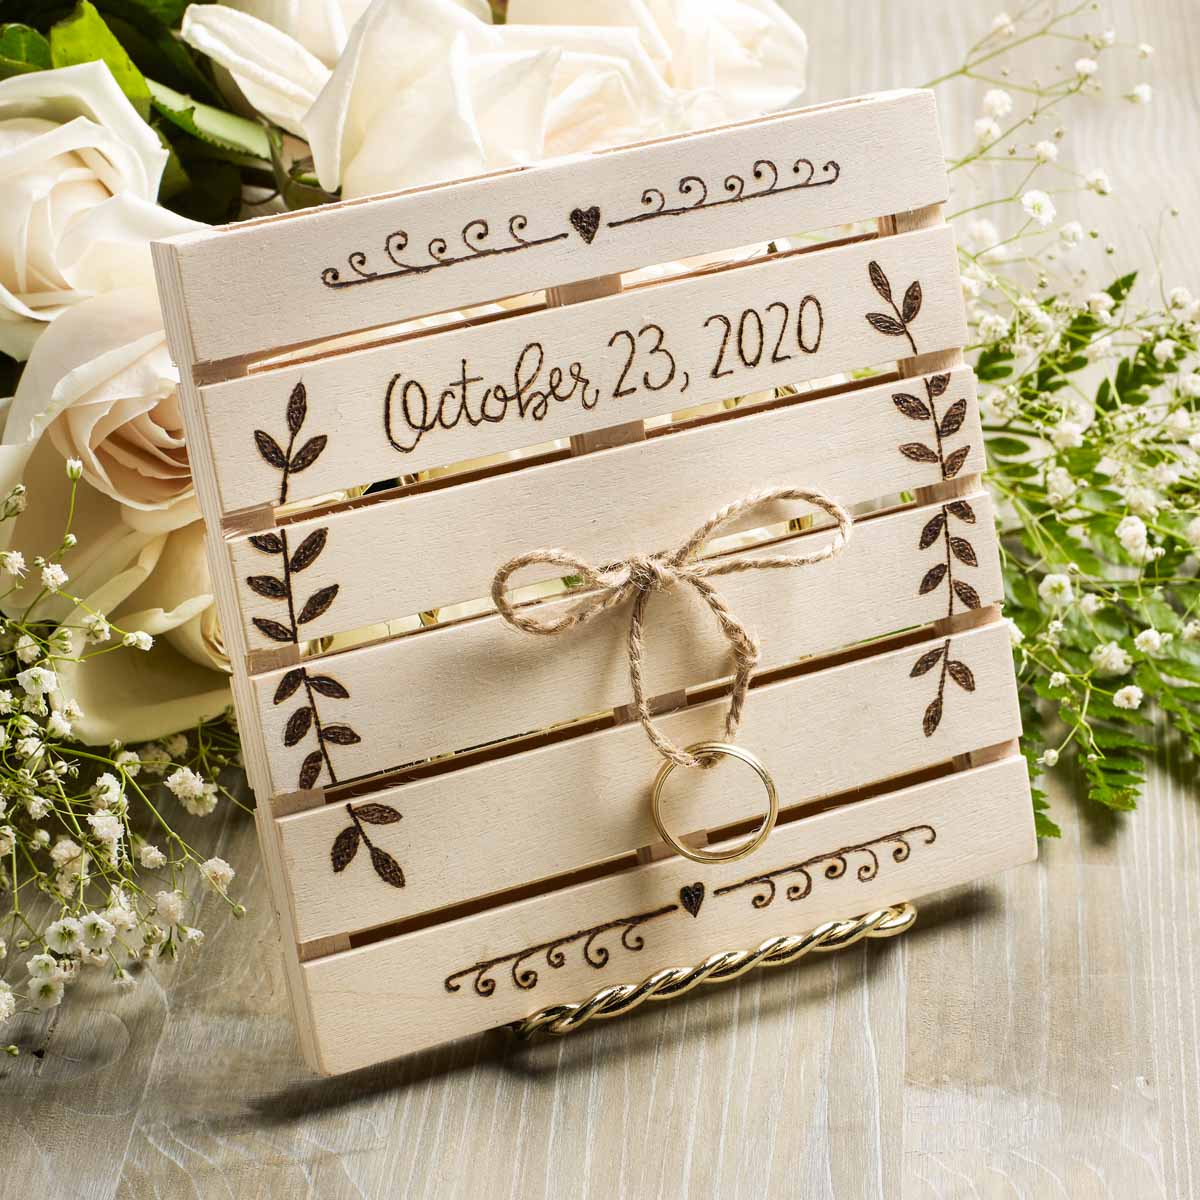 DIY Wood-Burned Wedding Ring Holder